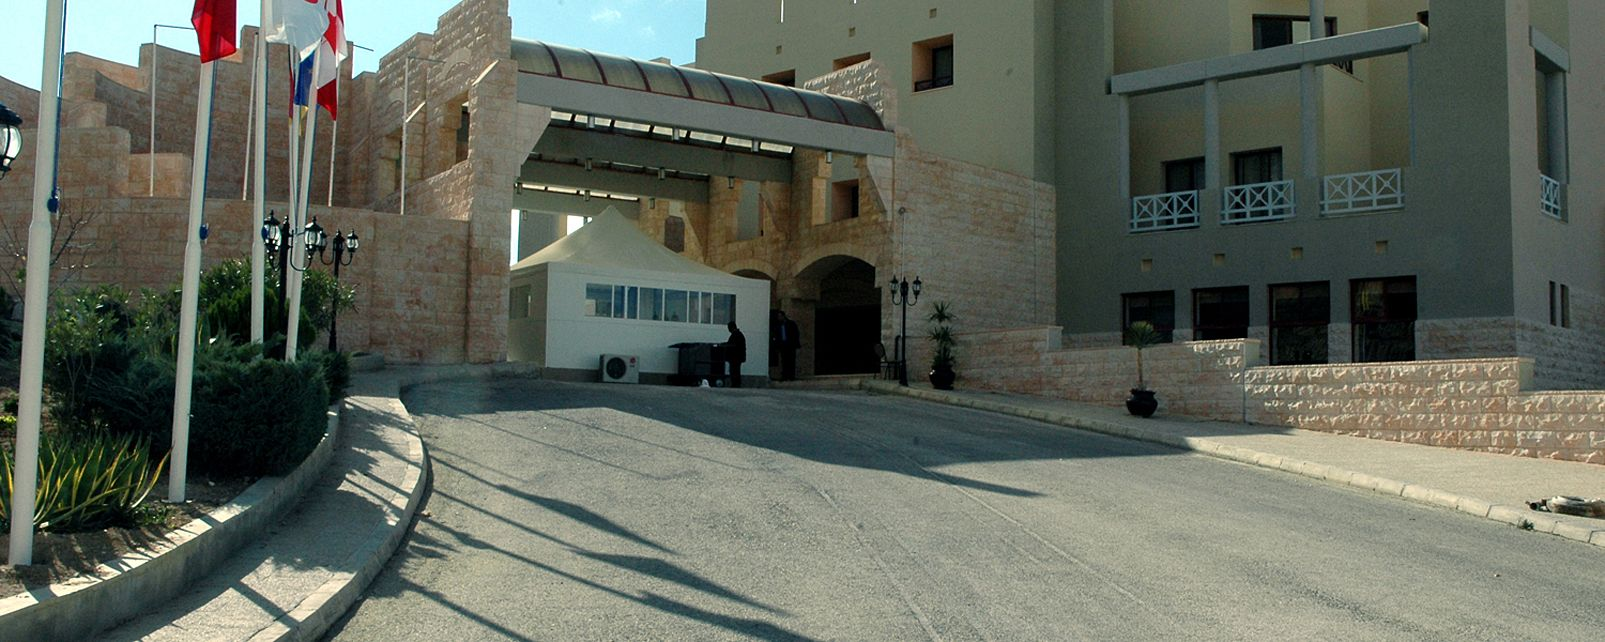 H tel moevenpick nabatean castle hotel petra jordanie for Hotels jordanie